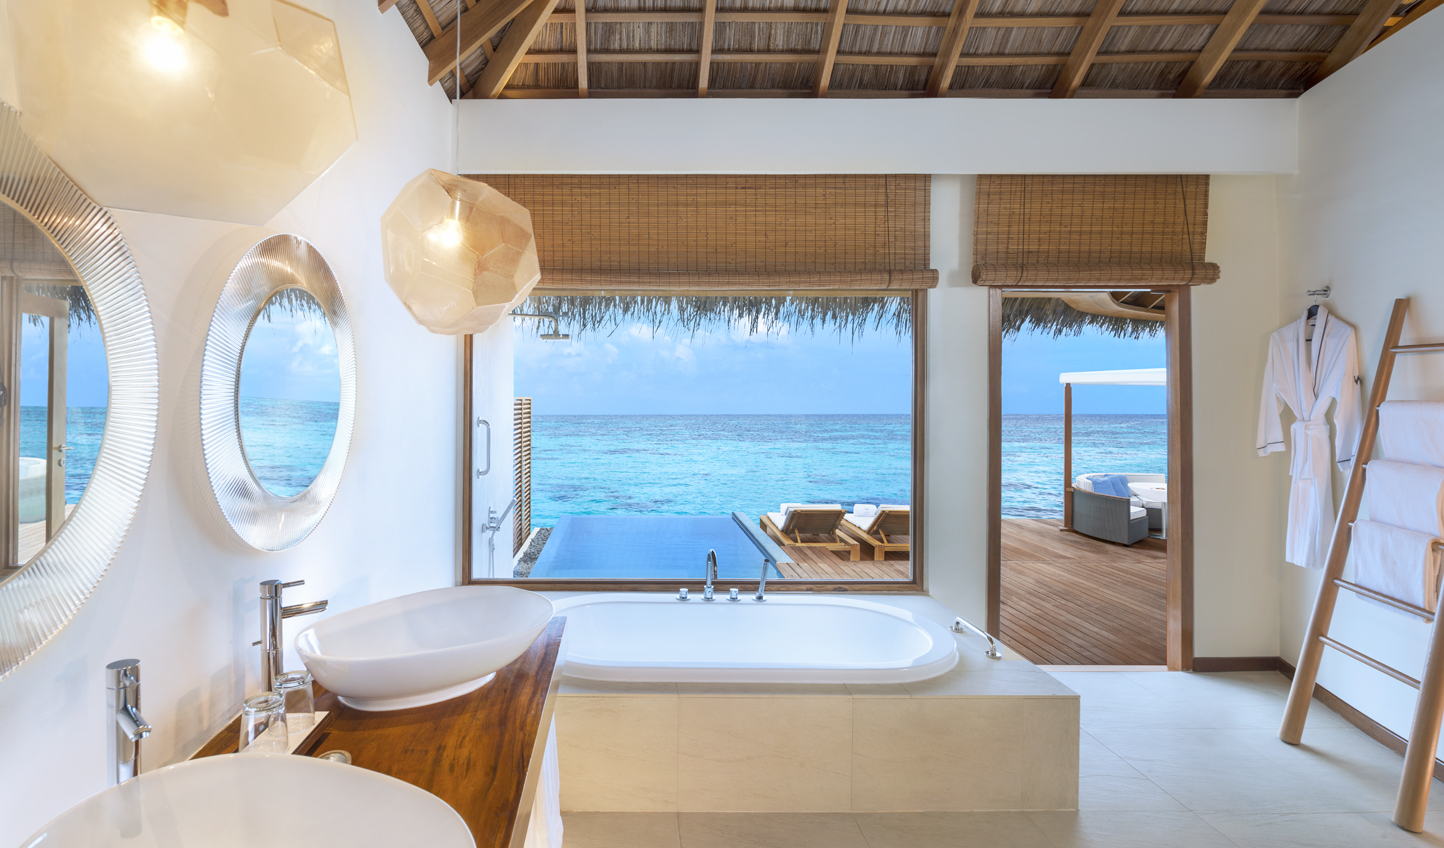 Luxurious bathrooms overlook beautiful lagoons